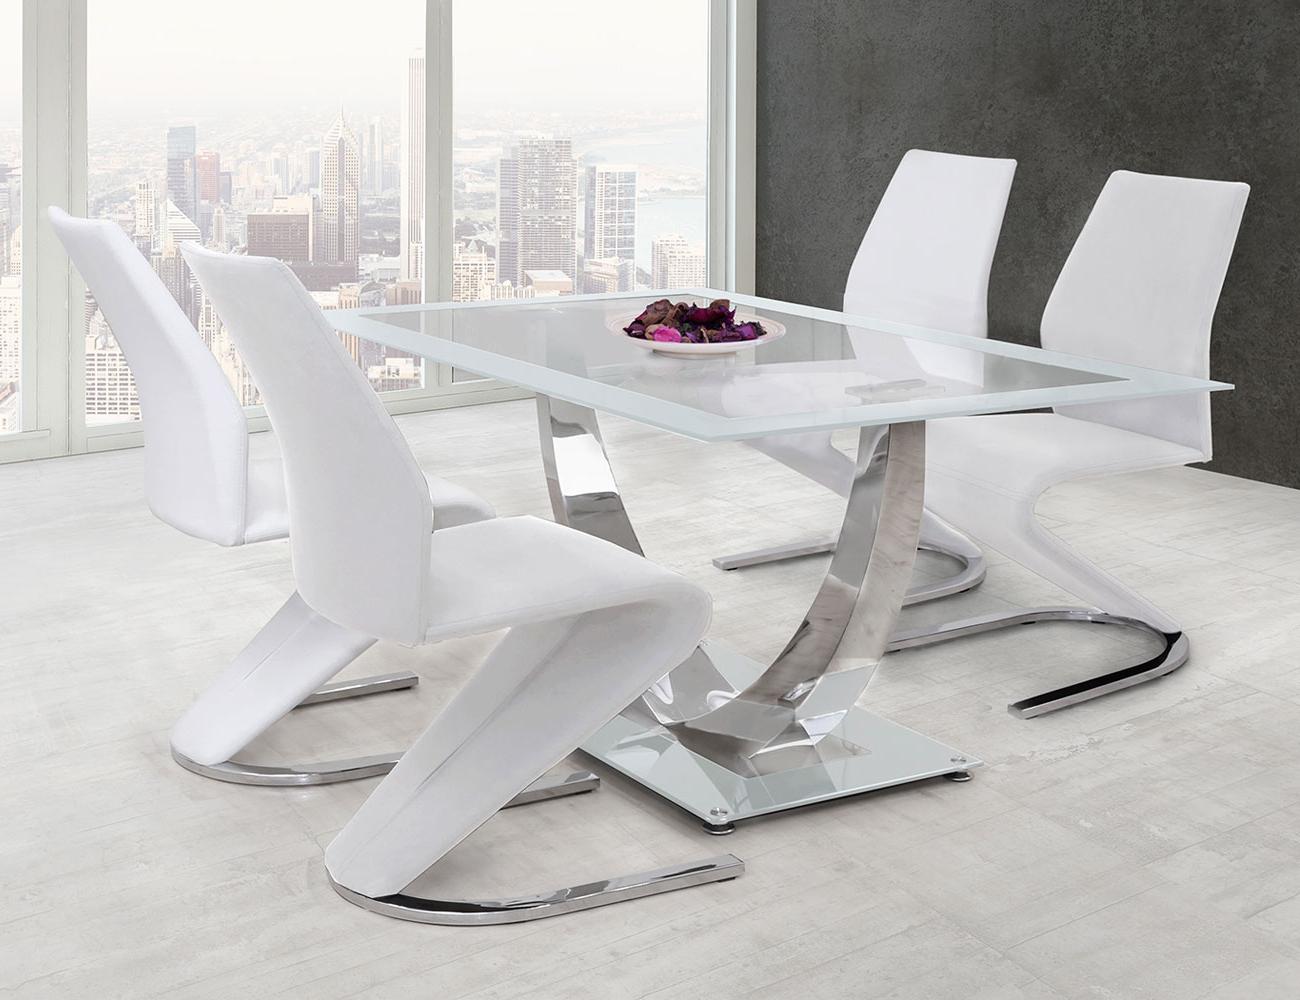 Mesas De Comedor Cristal E6d5 Mesa De Edor De Cristal Templado Decorativa En Blanco